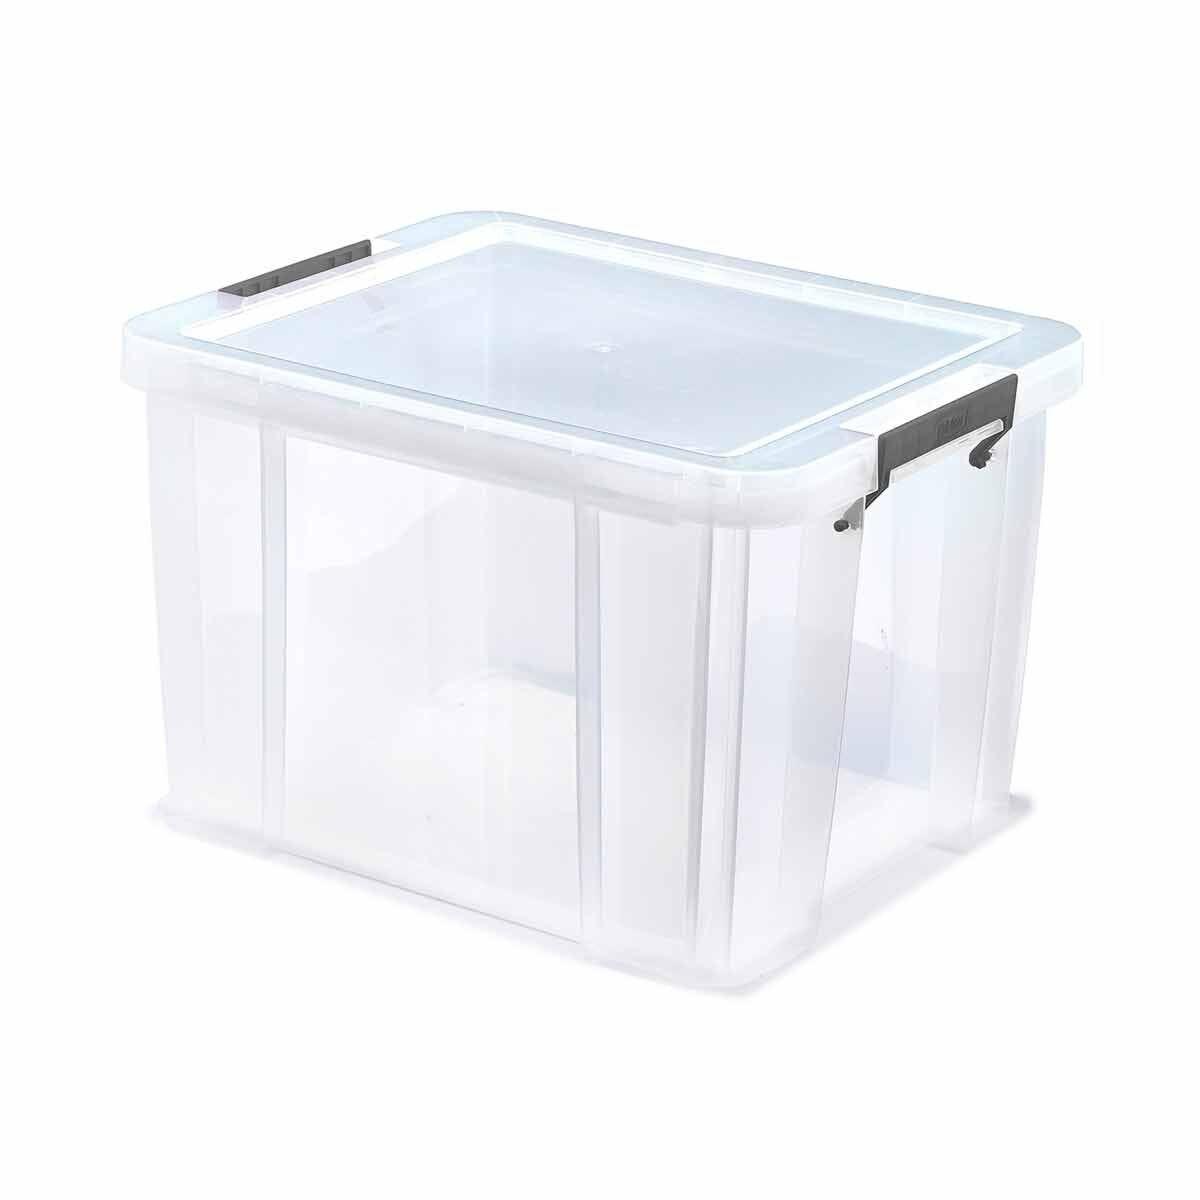 Whitefurze Allstore Plastic Storage Box 36 Litre